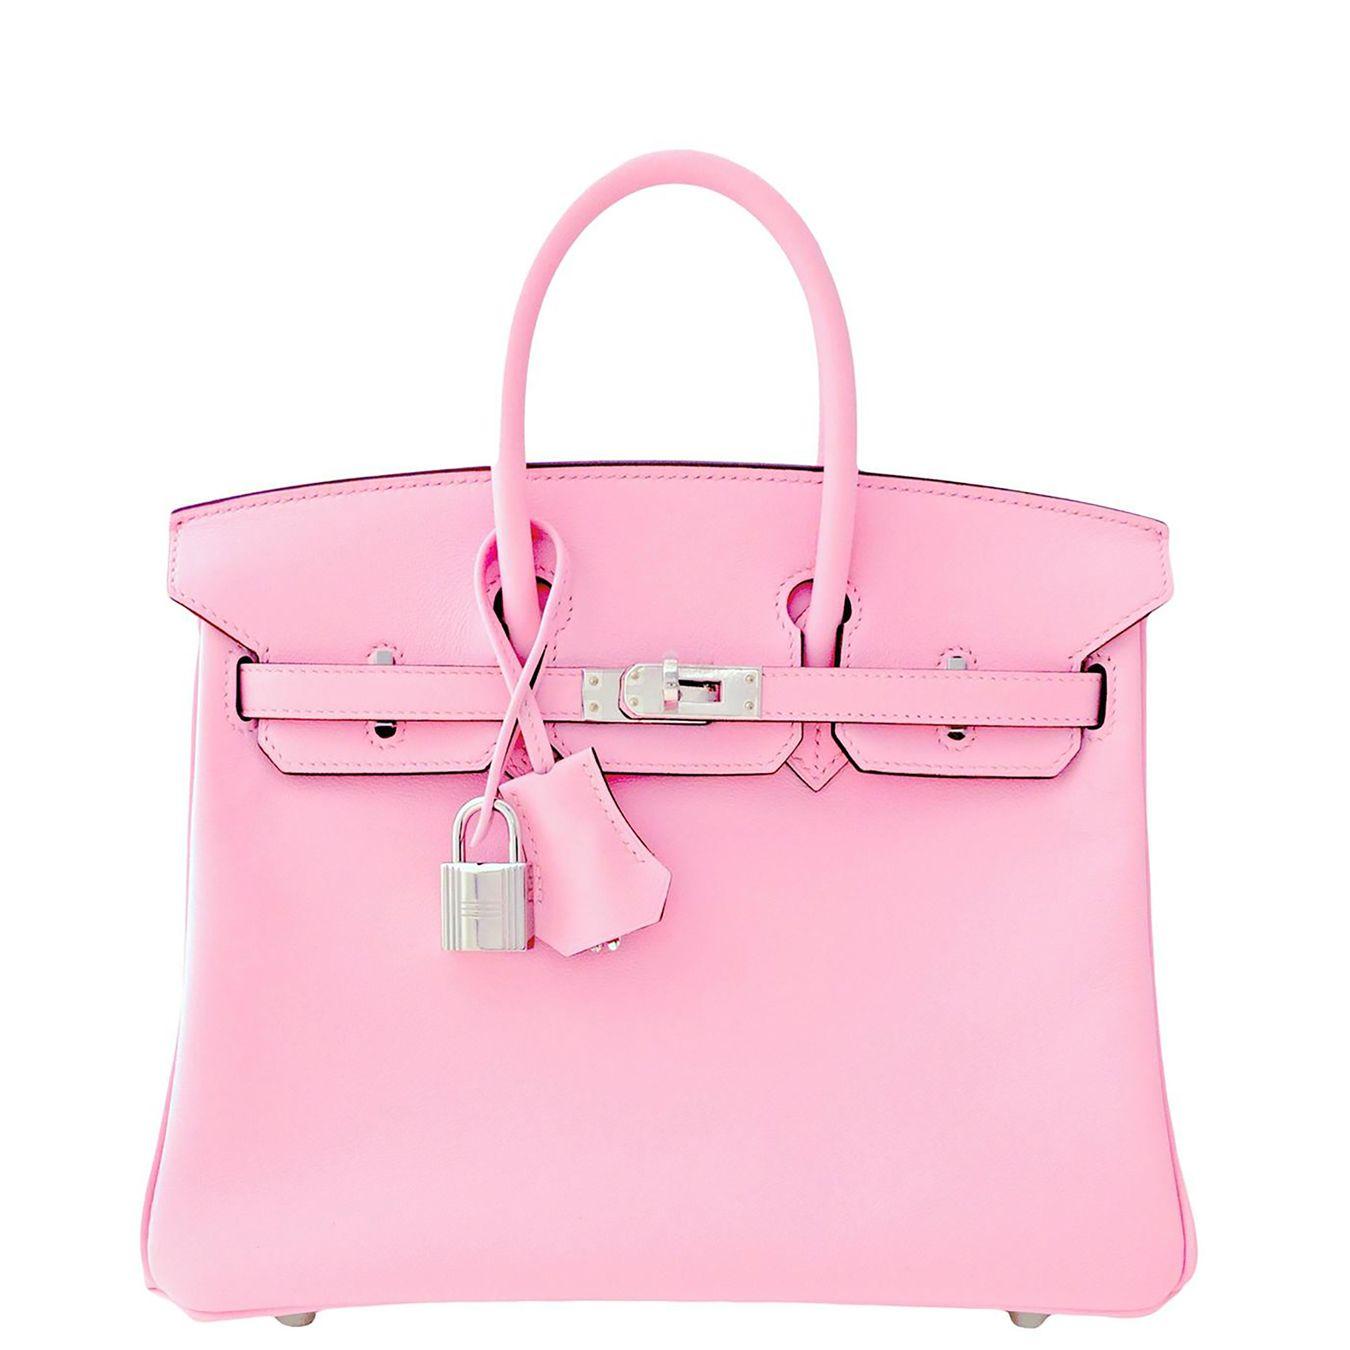 de001385a6 Hermes Birkin Bag 25cm Rose Sakura Pink Swift Palladium Hardware Image 1